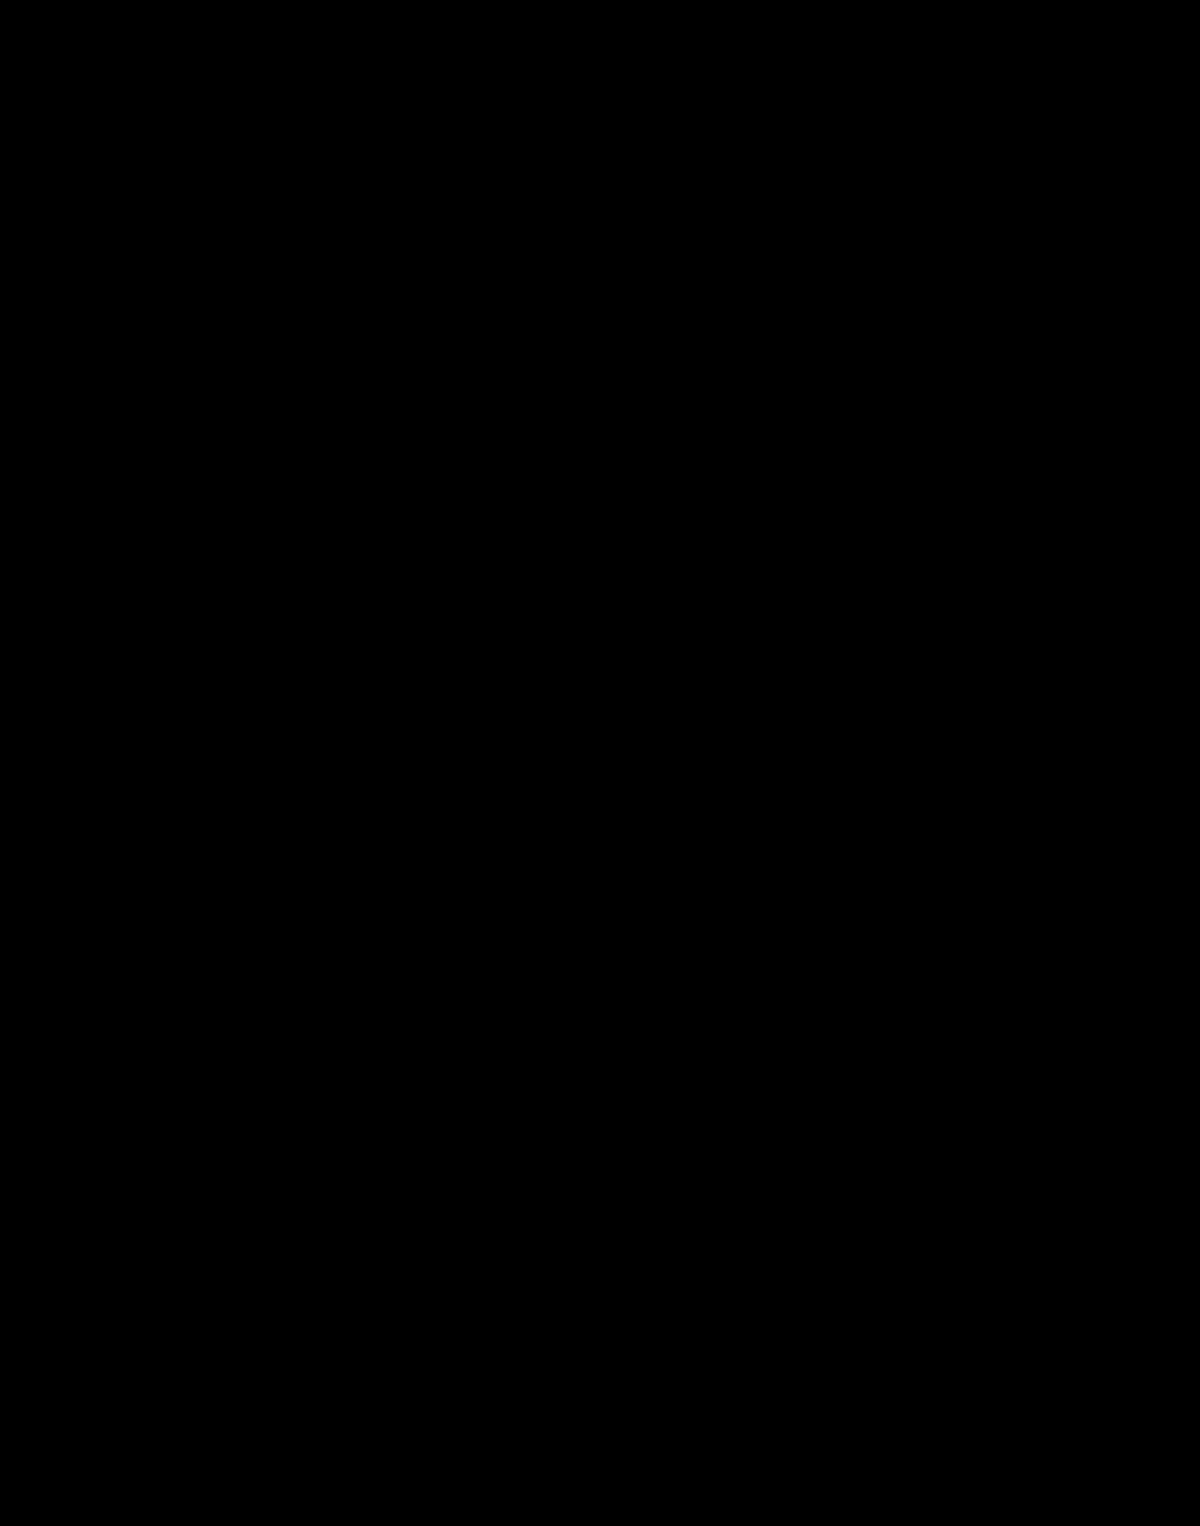 Clipart kok kan black and white Names of China - Wikipedia black and white